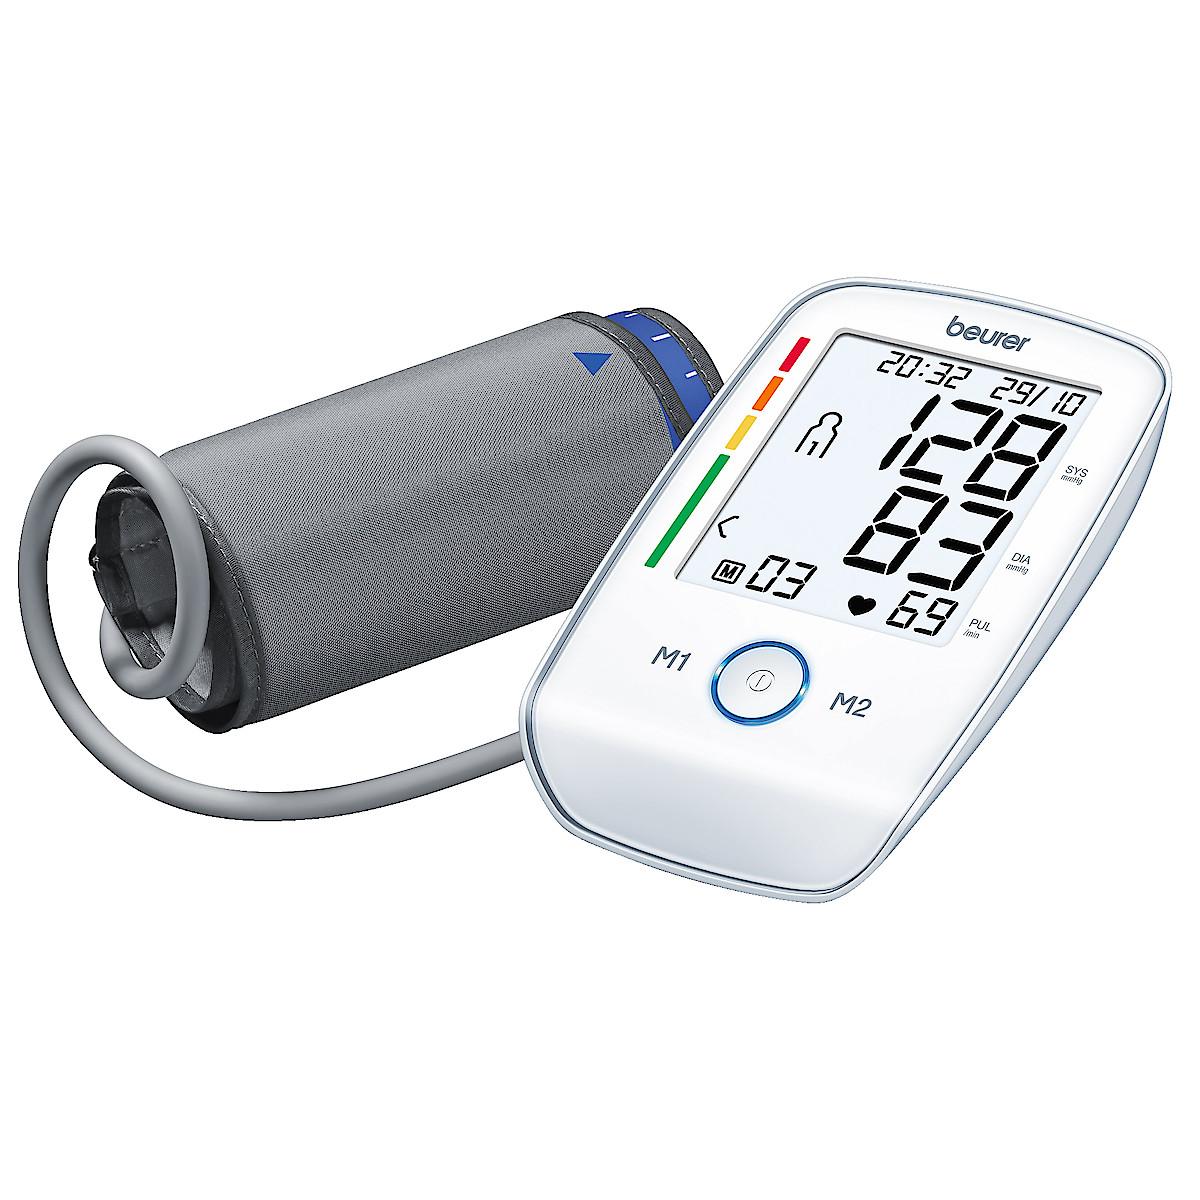 Blodtrycksmätare Beurer BM 45